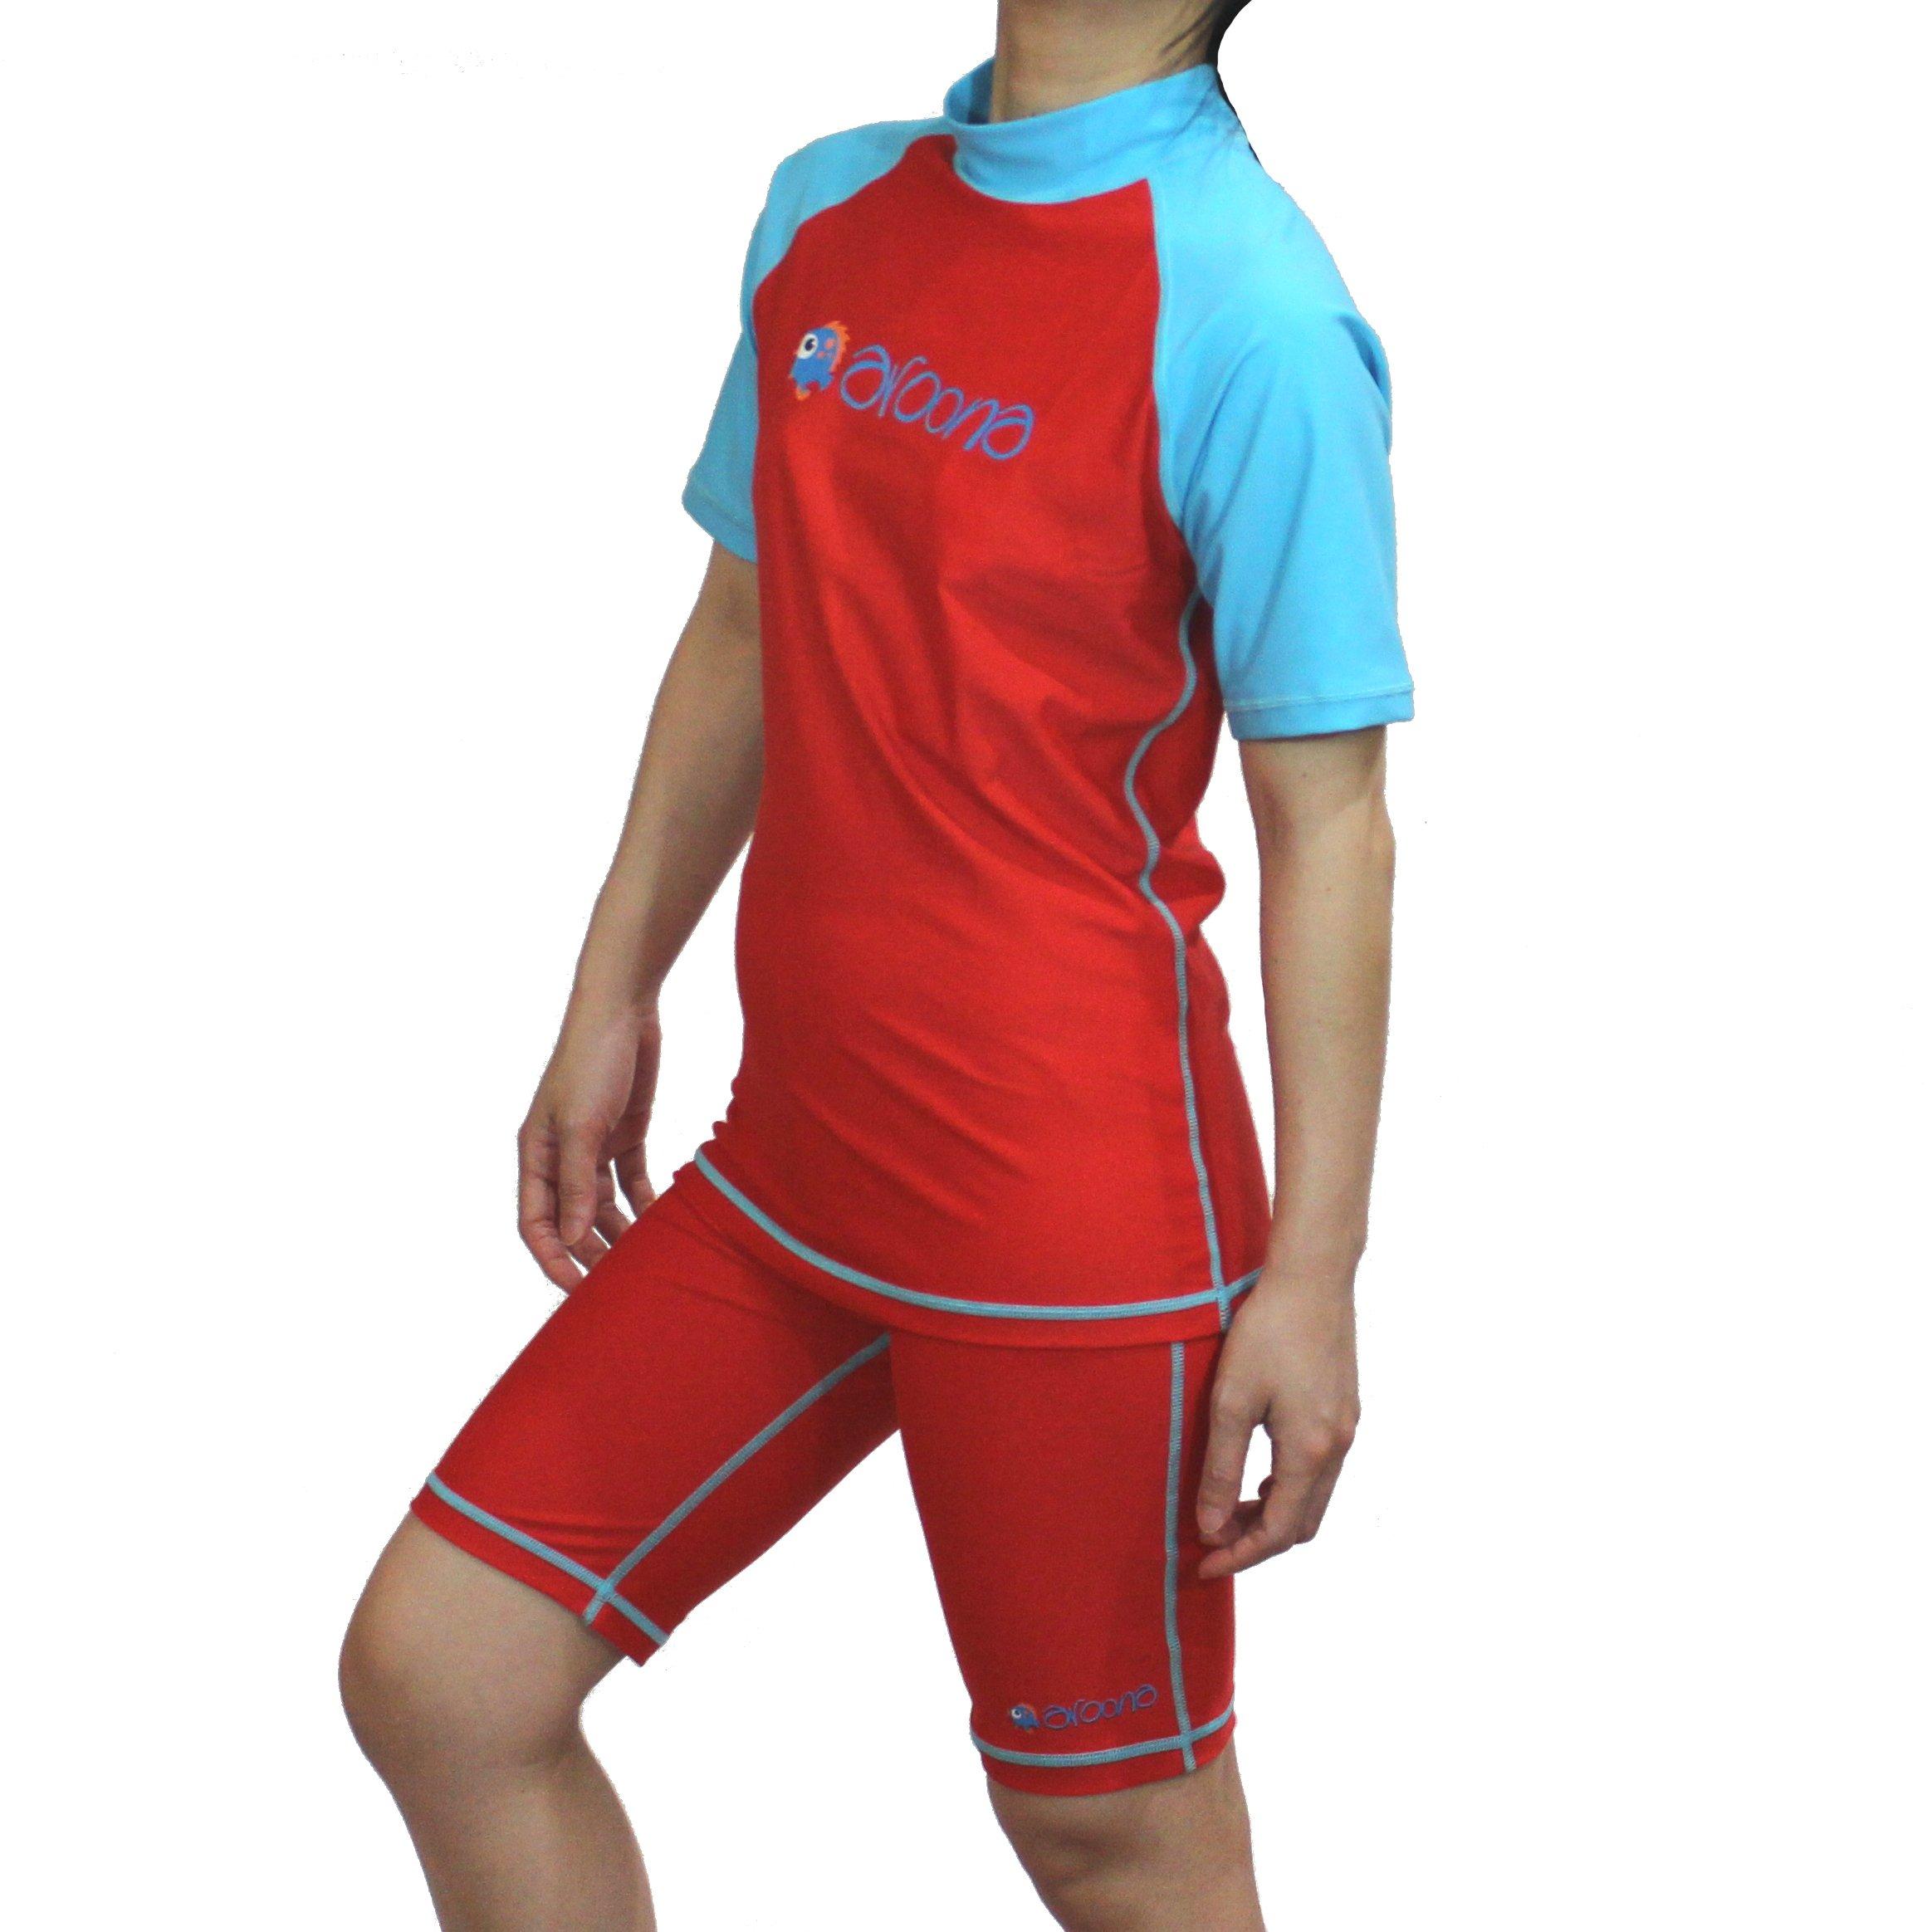 Wenge Girls Bathing Suits Girls Two Piece Swimsuit Rash Guard Sets 3-12 Years